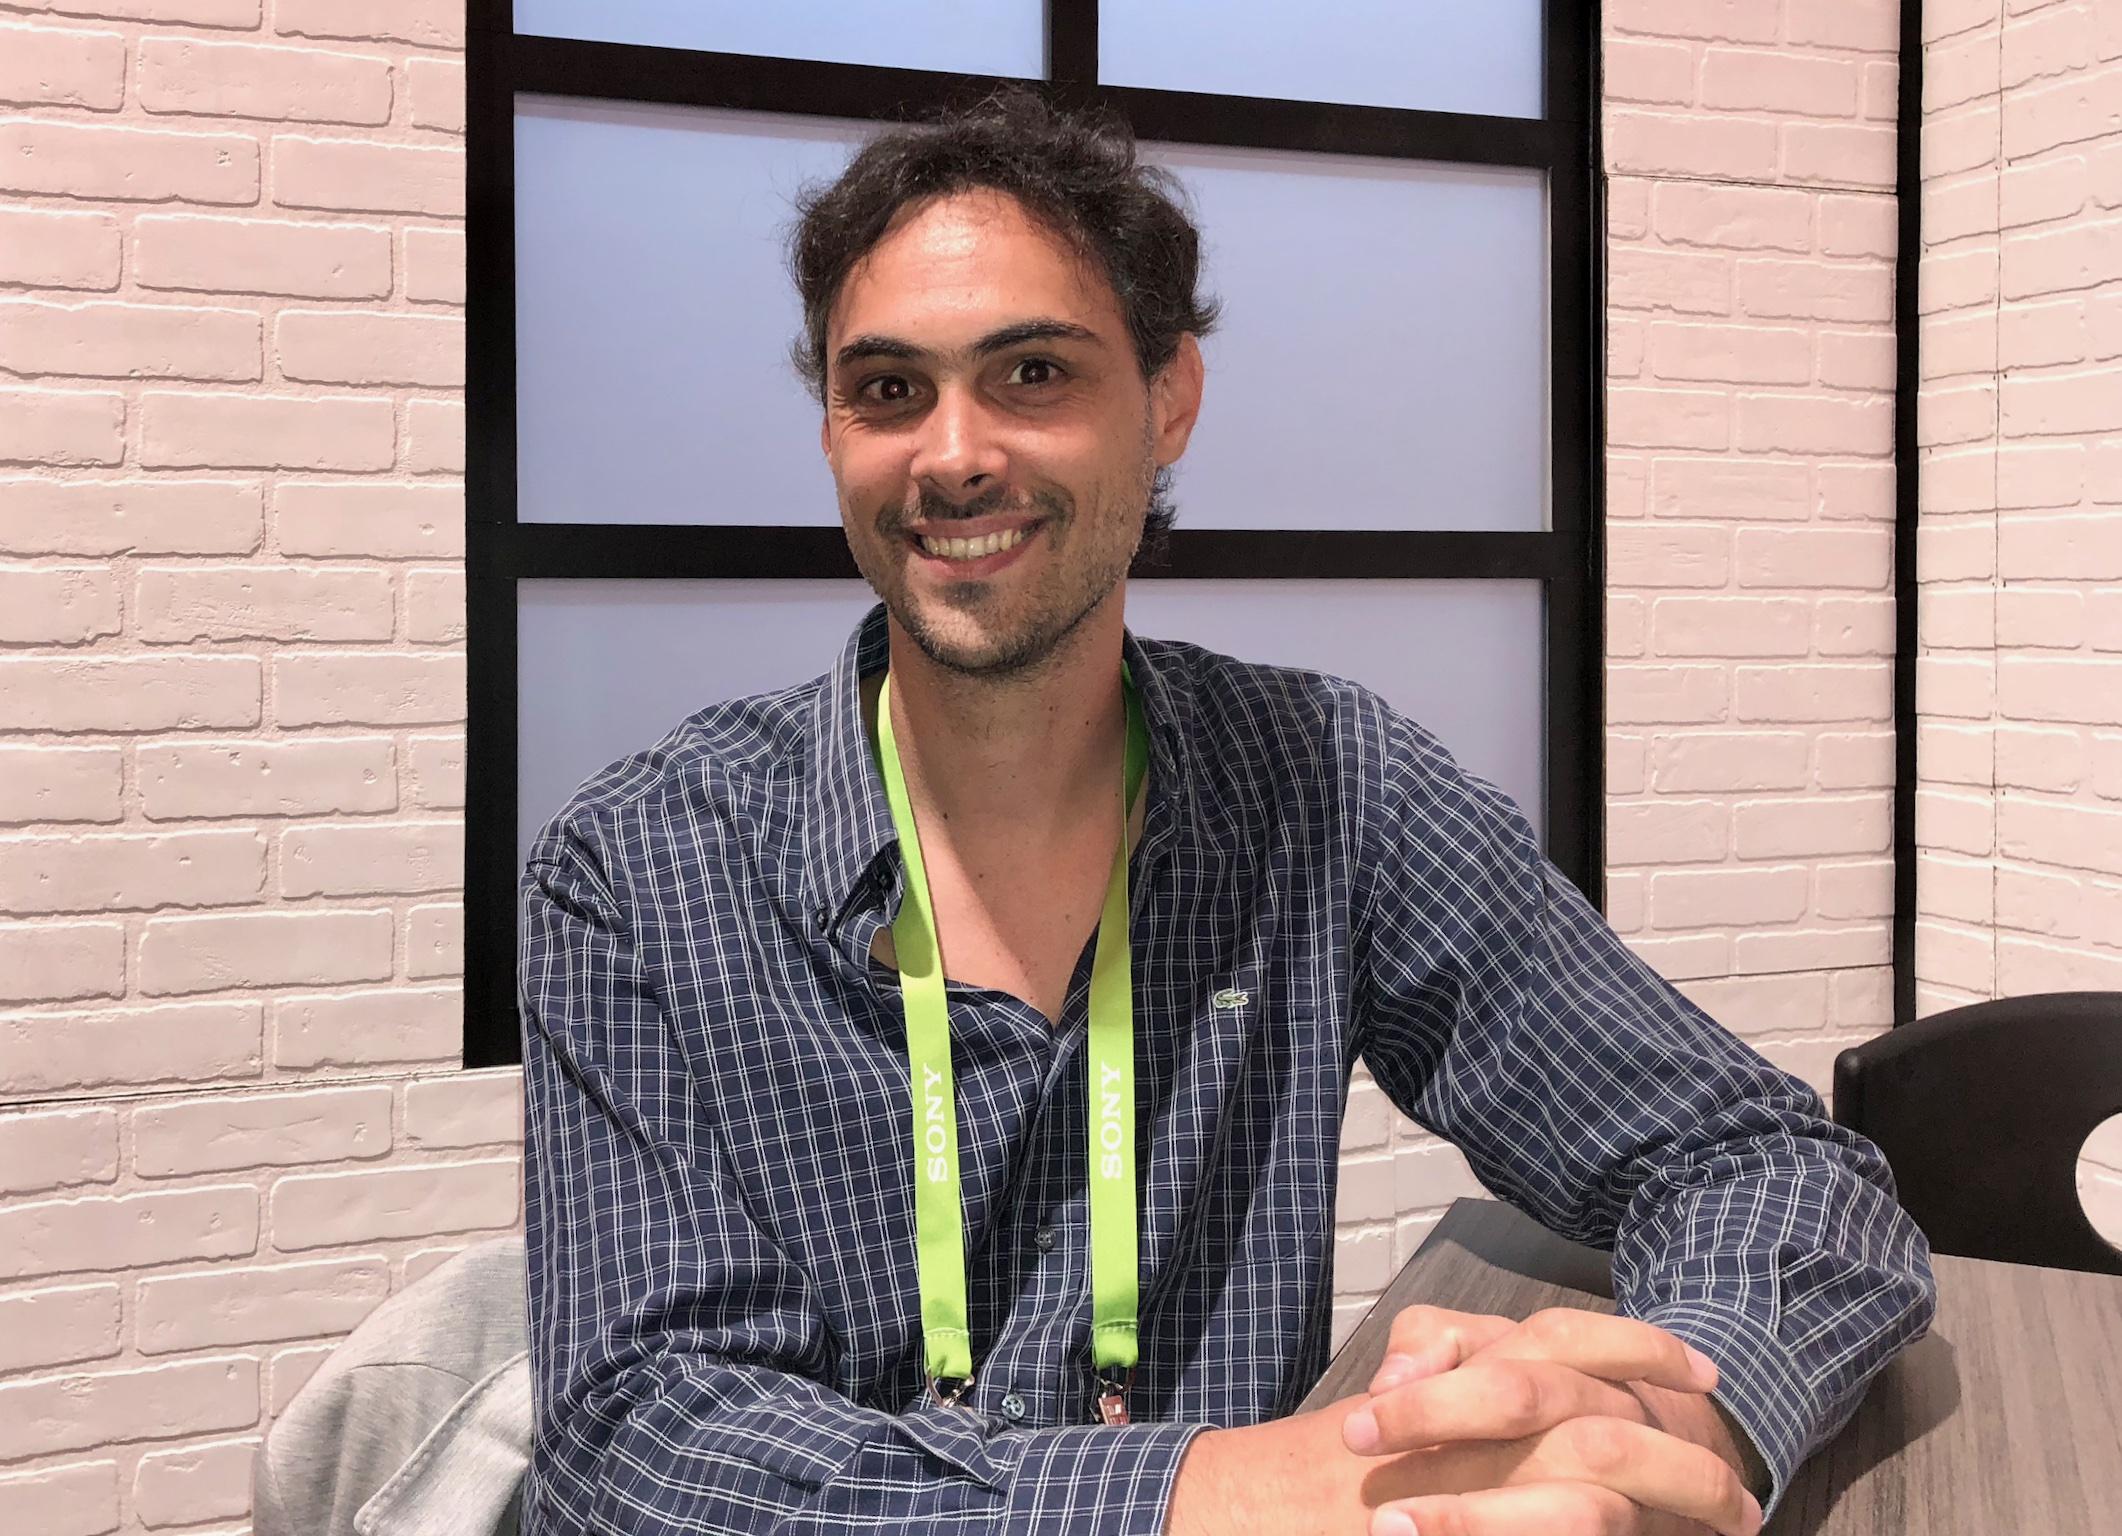 Demian Gawianski, COO of Smart International Group